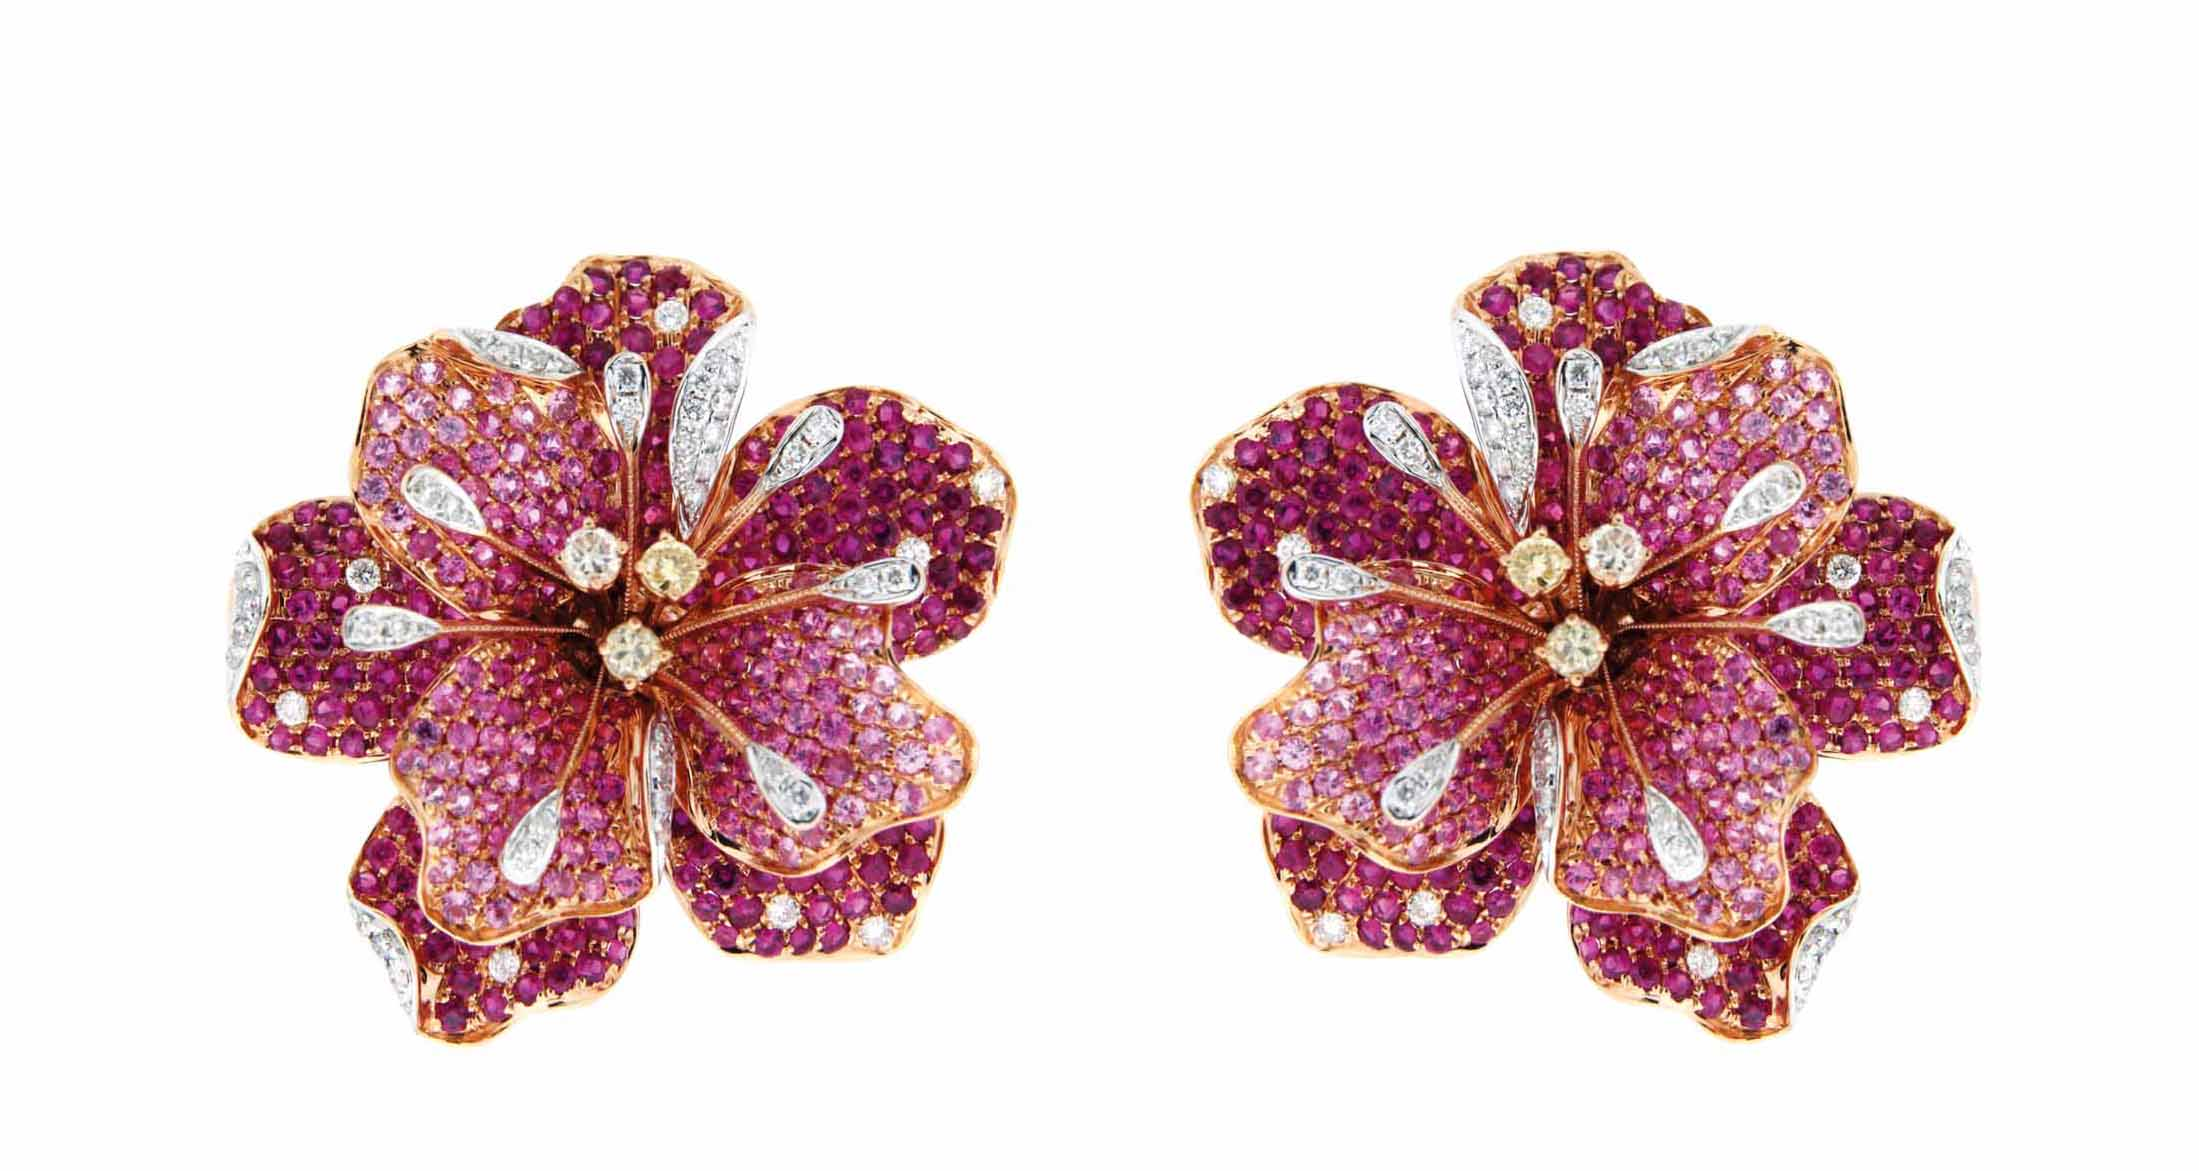 Temptations Jewellery